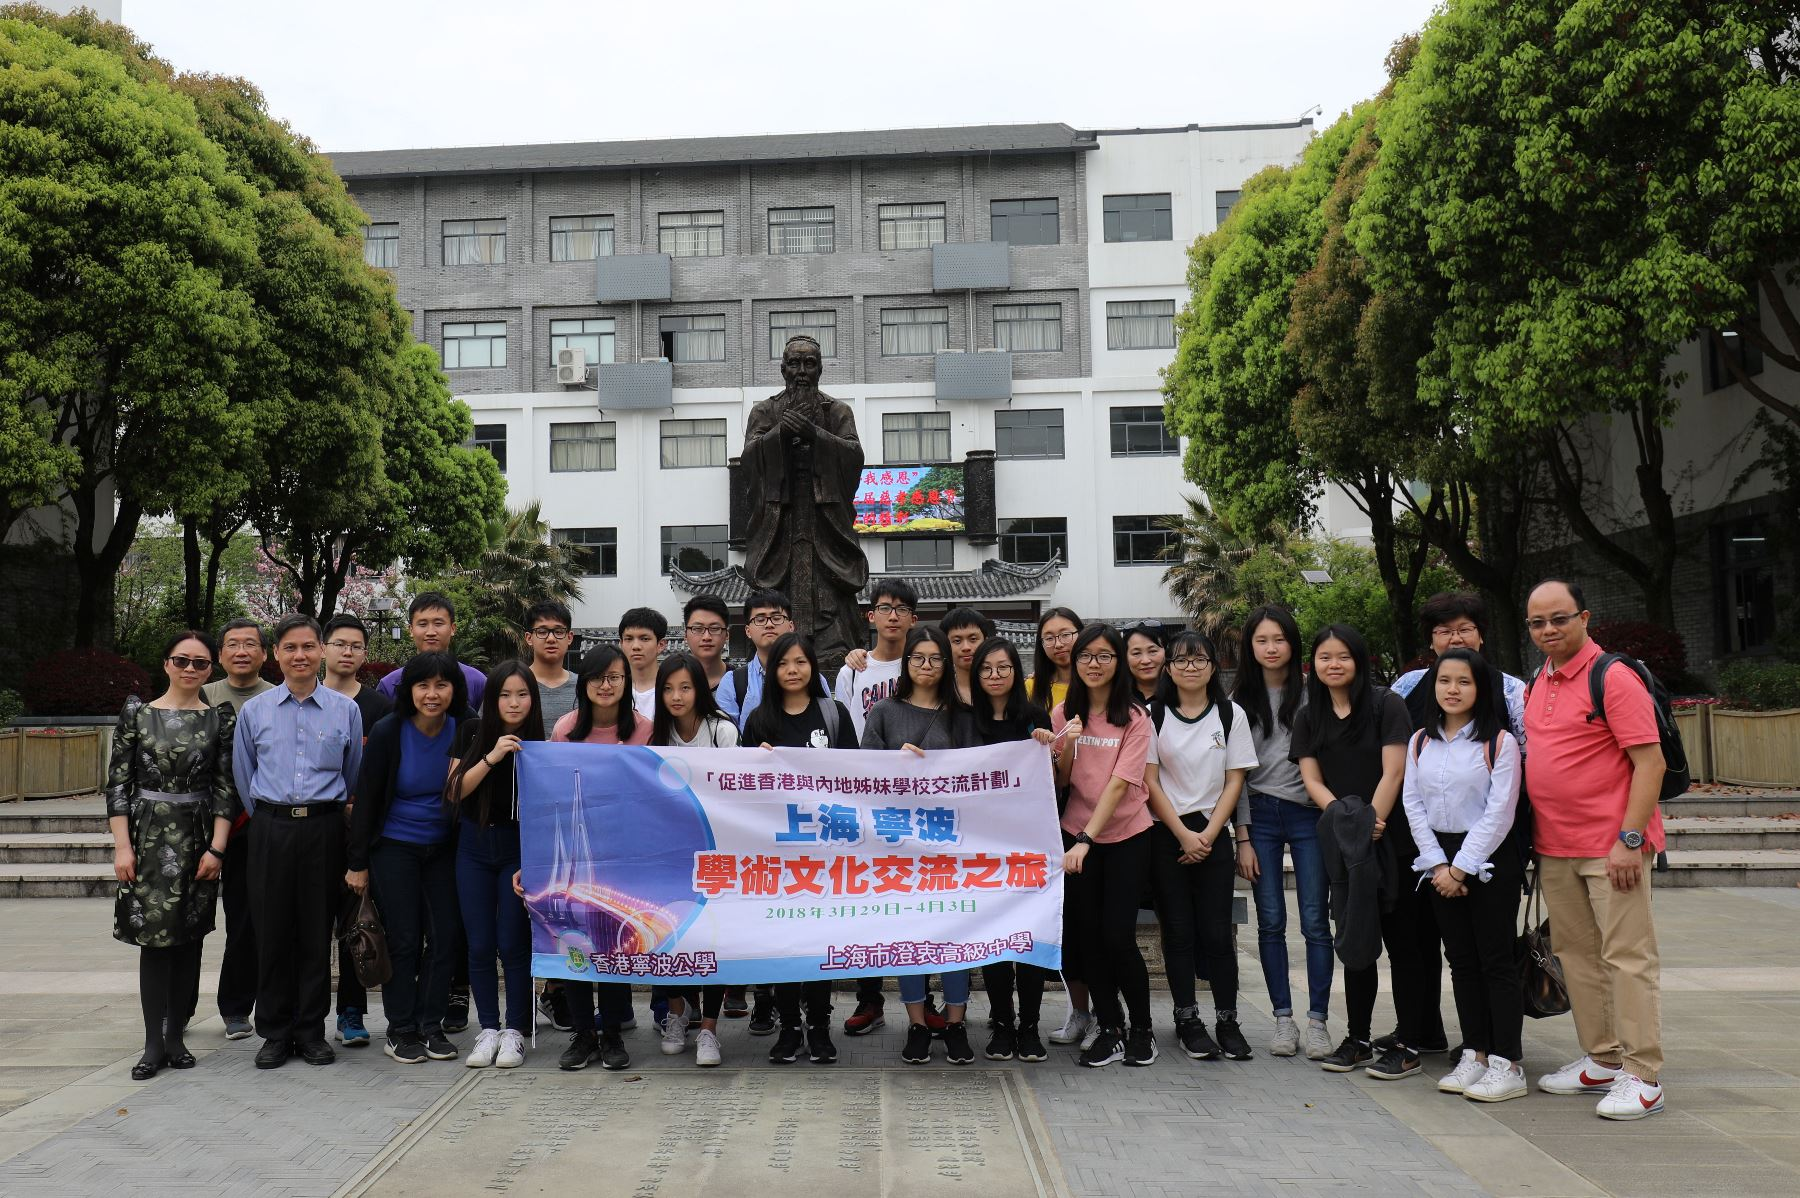 http://npc.edu.hk/sites/default/files/34_15.jpg